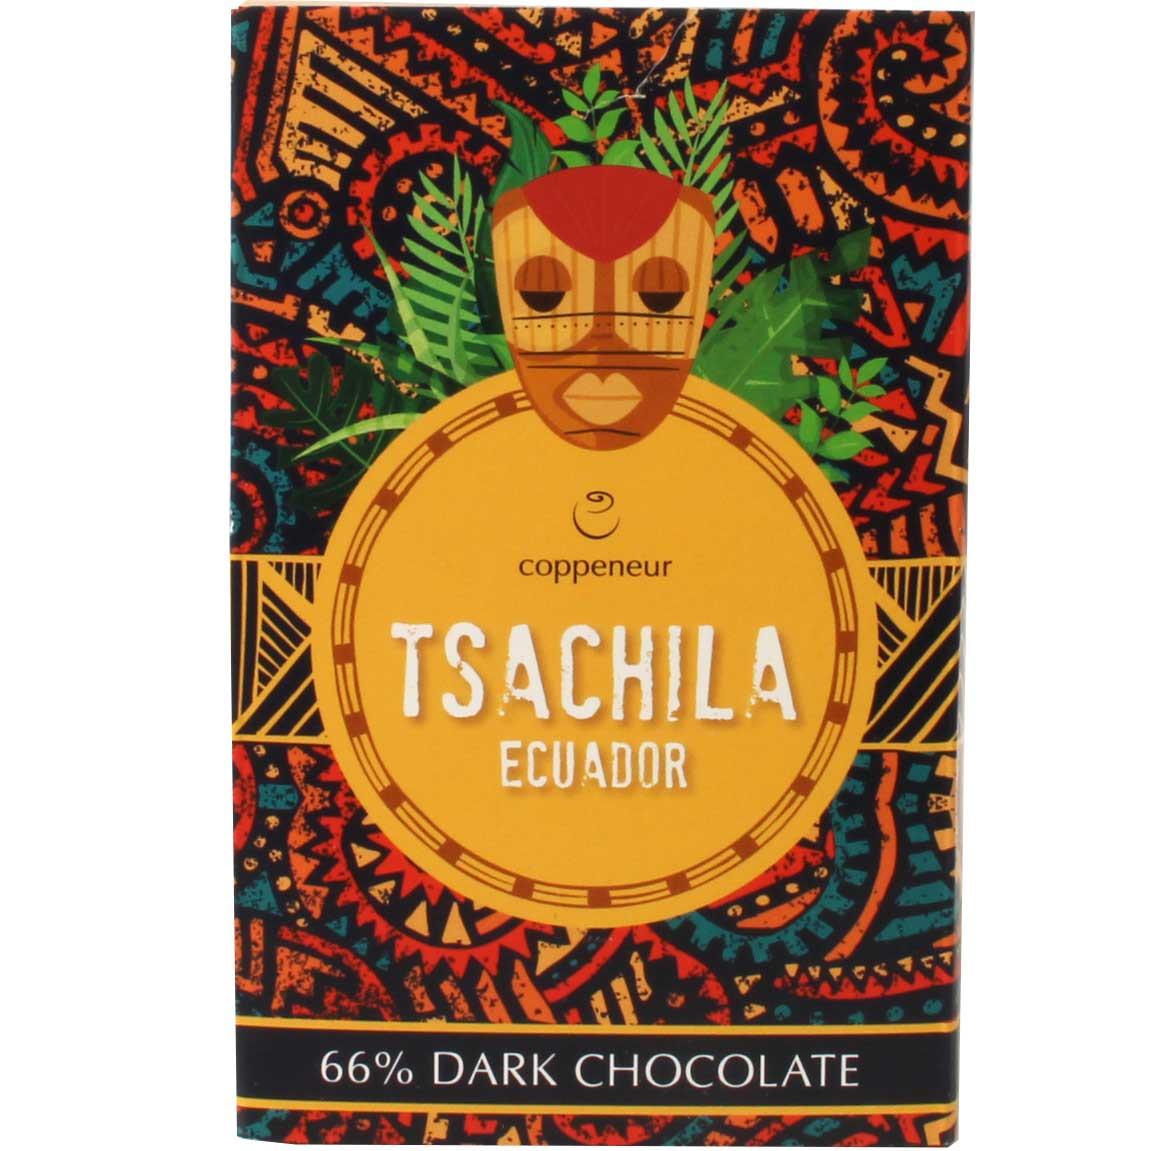 Tsáchila Ecuador 66% dunkle Schokolade - Barras de chocolate, chocolate sin lecitina, vegan-amigable, Alemania, chocolate alemán - Chocolats-De-Luxe